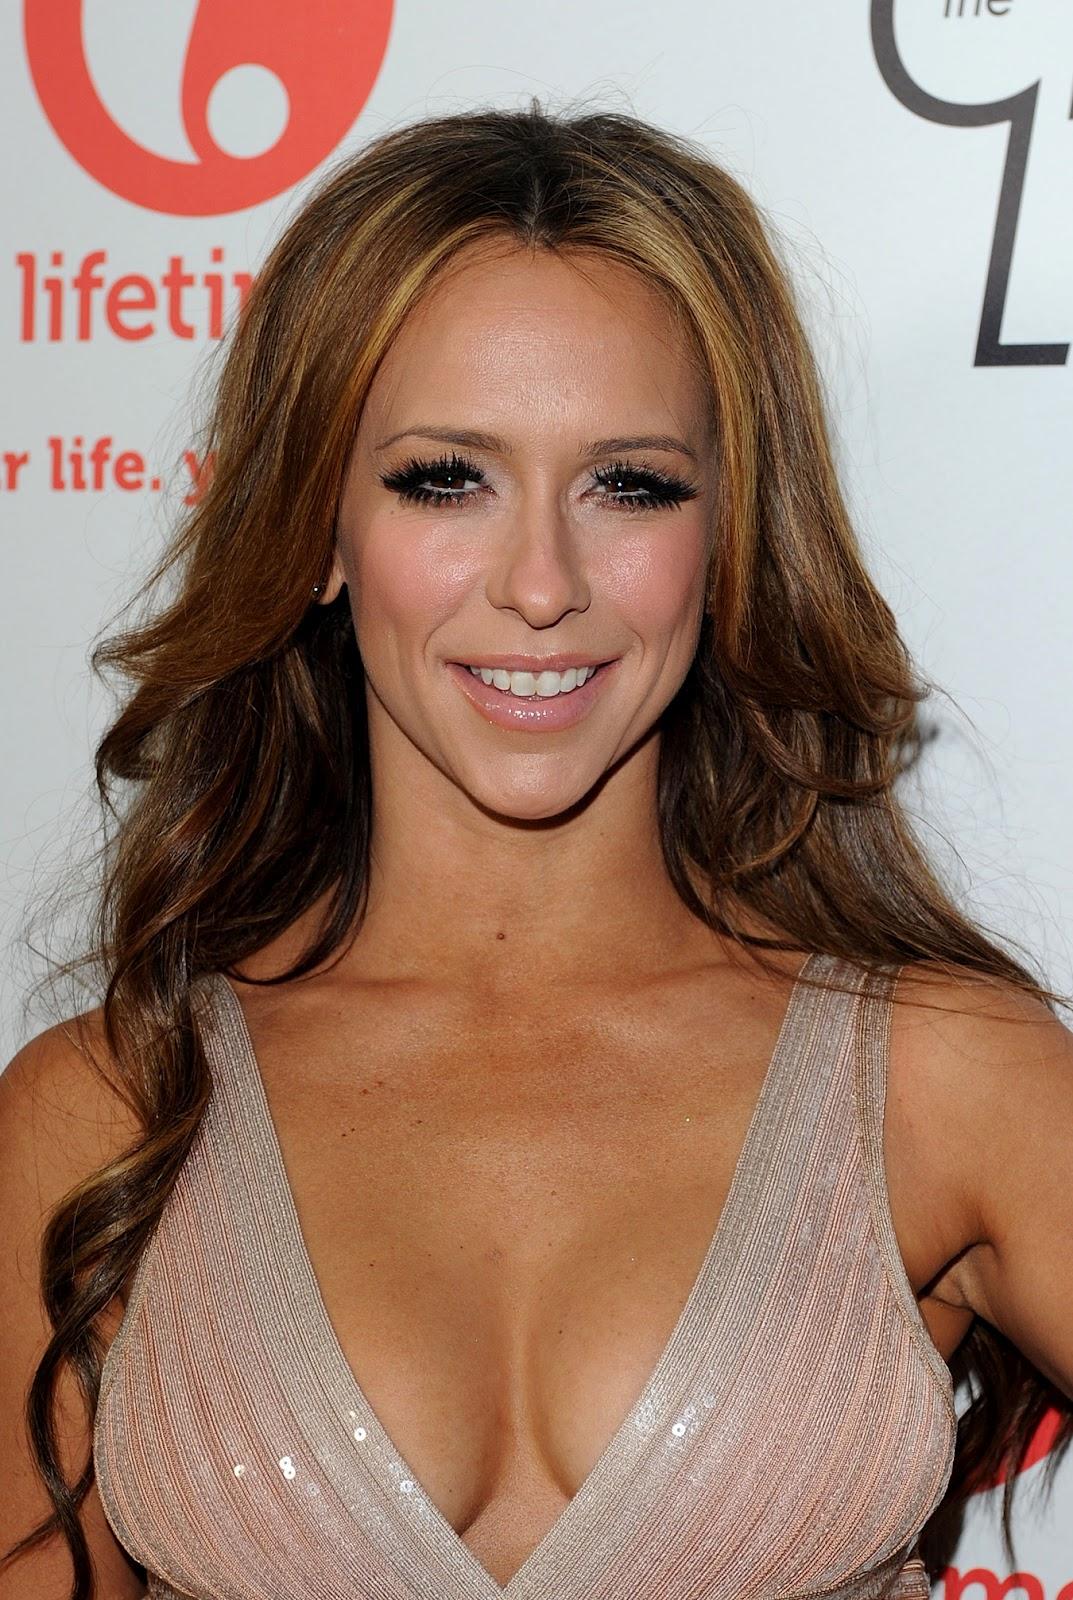 http://3.bp.blogspot.com/-WamGwSeW7WA/T7DY2V8UByI/AAAAAAAAdNA/zjzmxRPdnuE/s1600/Jennifer+Love+Hewitt+-+The+Client+List+69.jpg